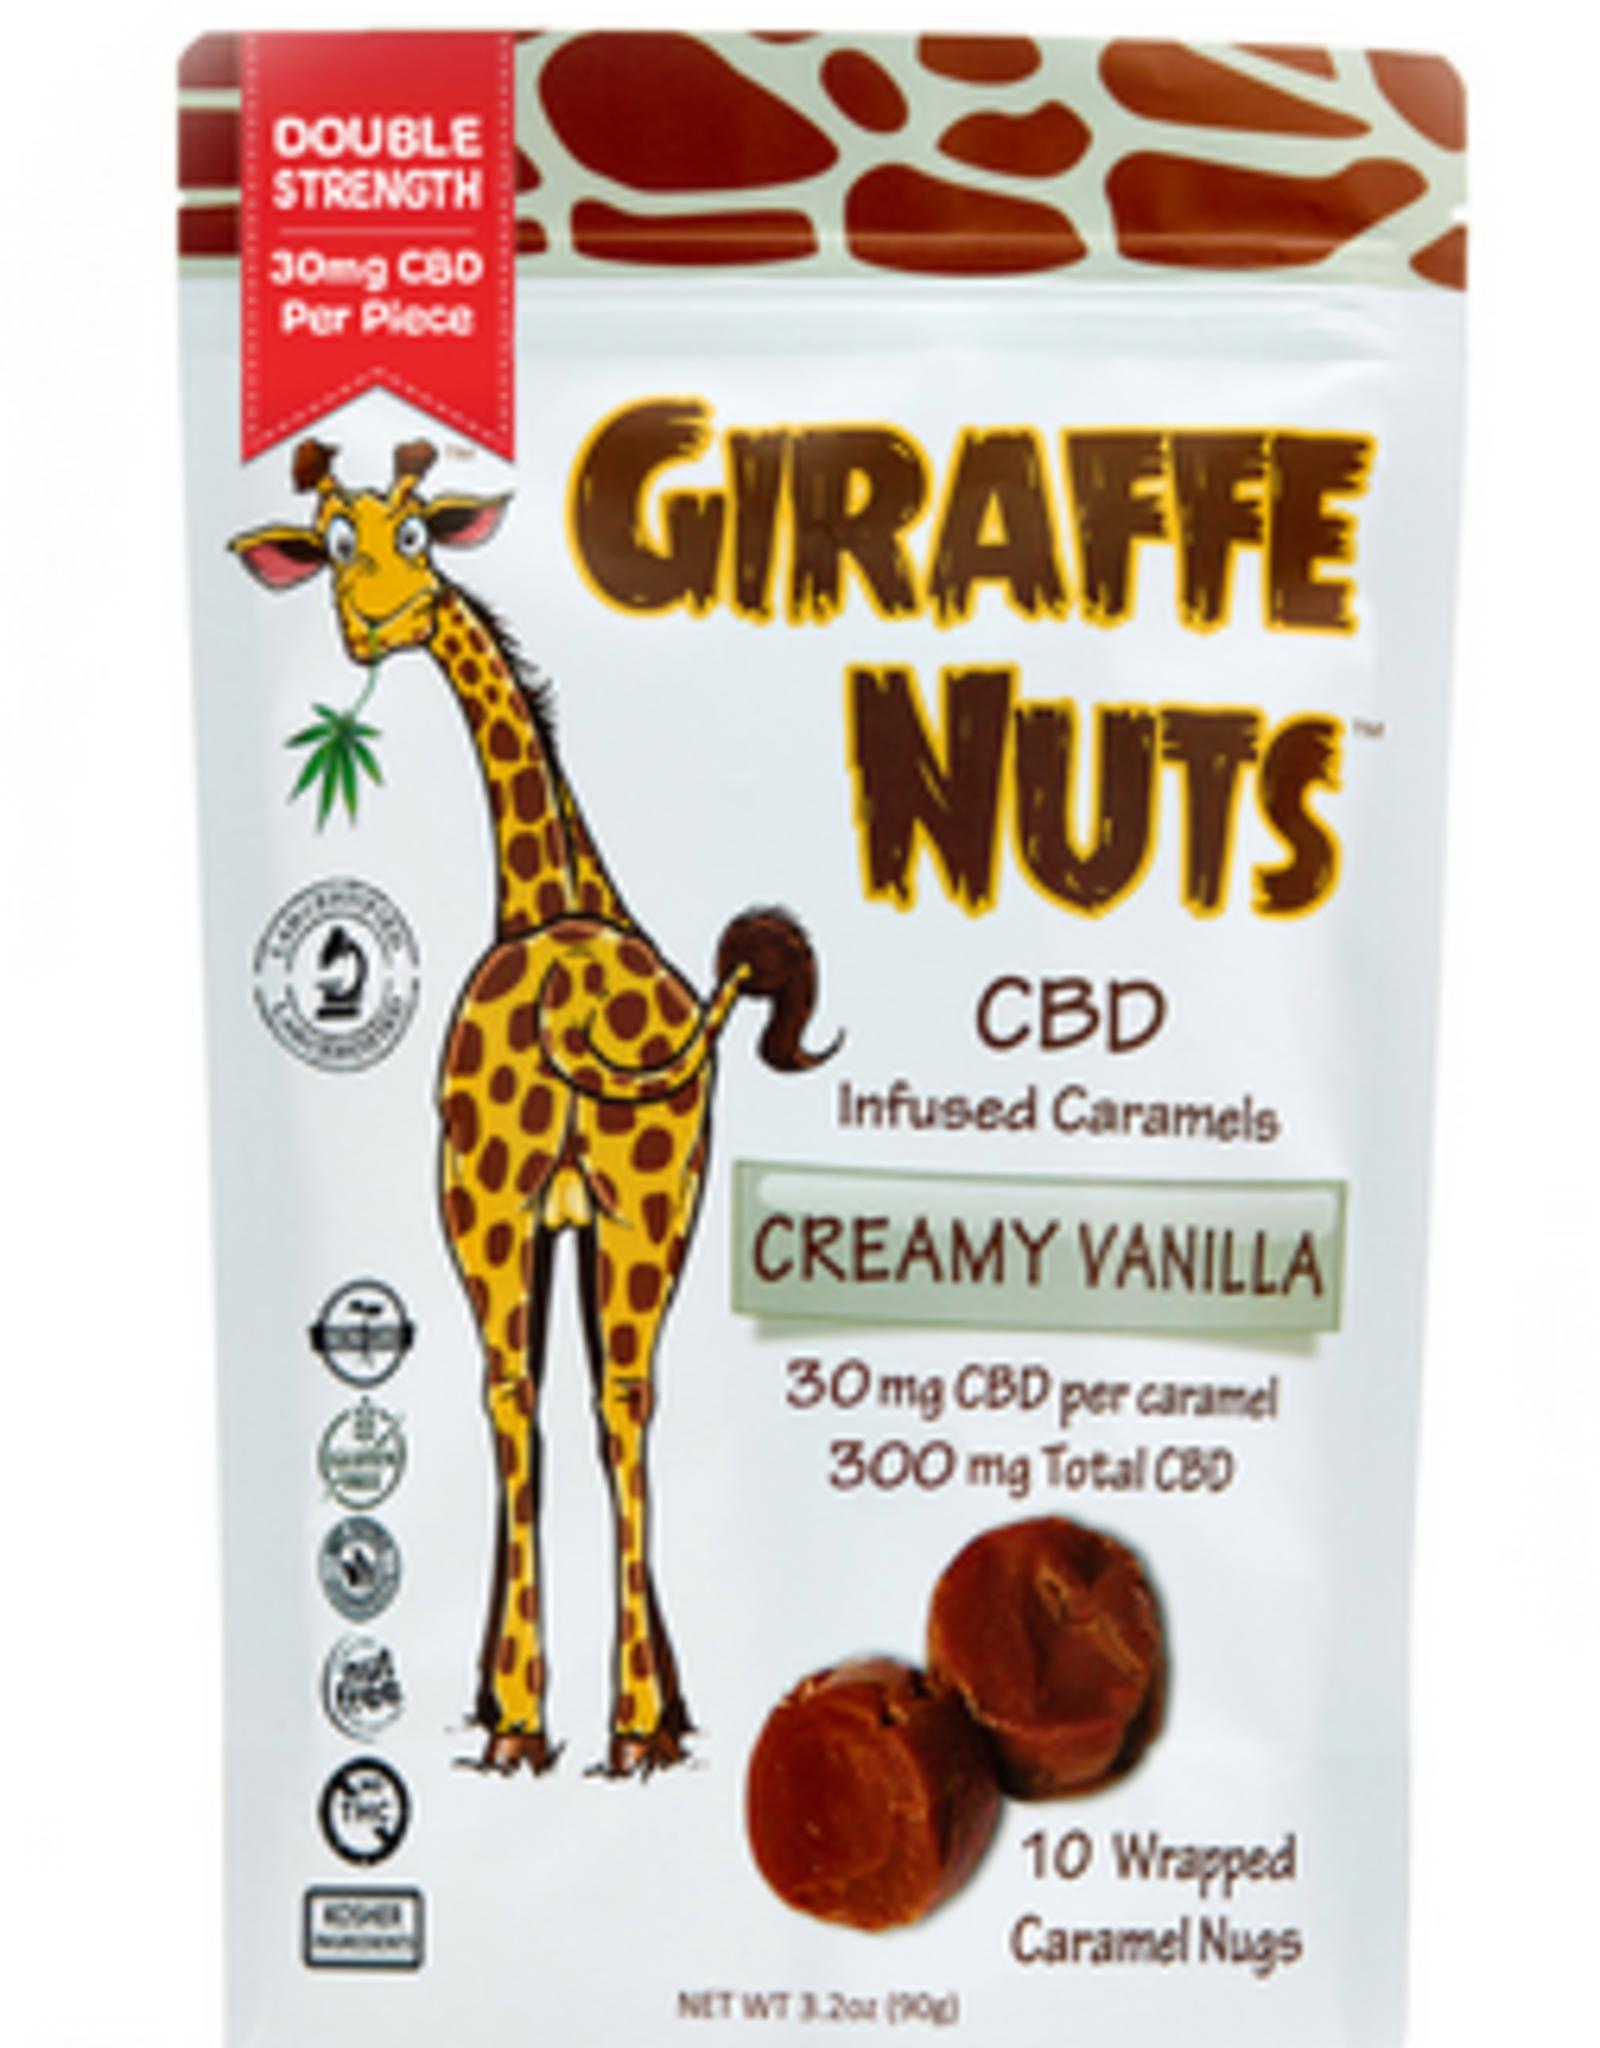 Lions Brand CBD CBD Giraffe Nuts Creamy Vanilla 300mg